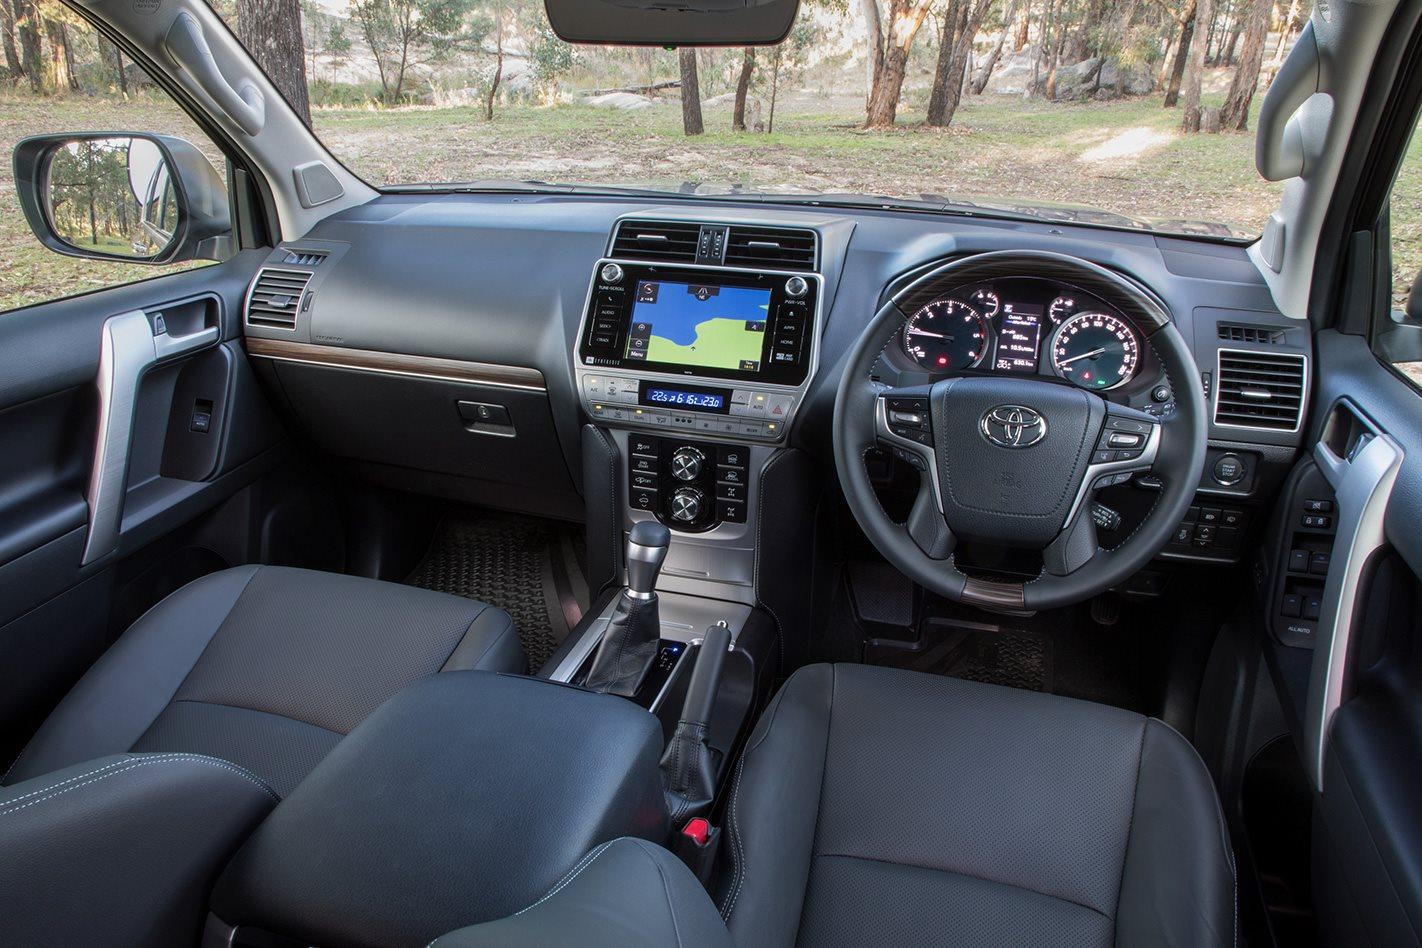 Toyota Prado GXL interior